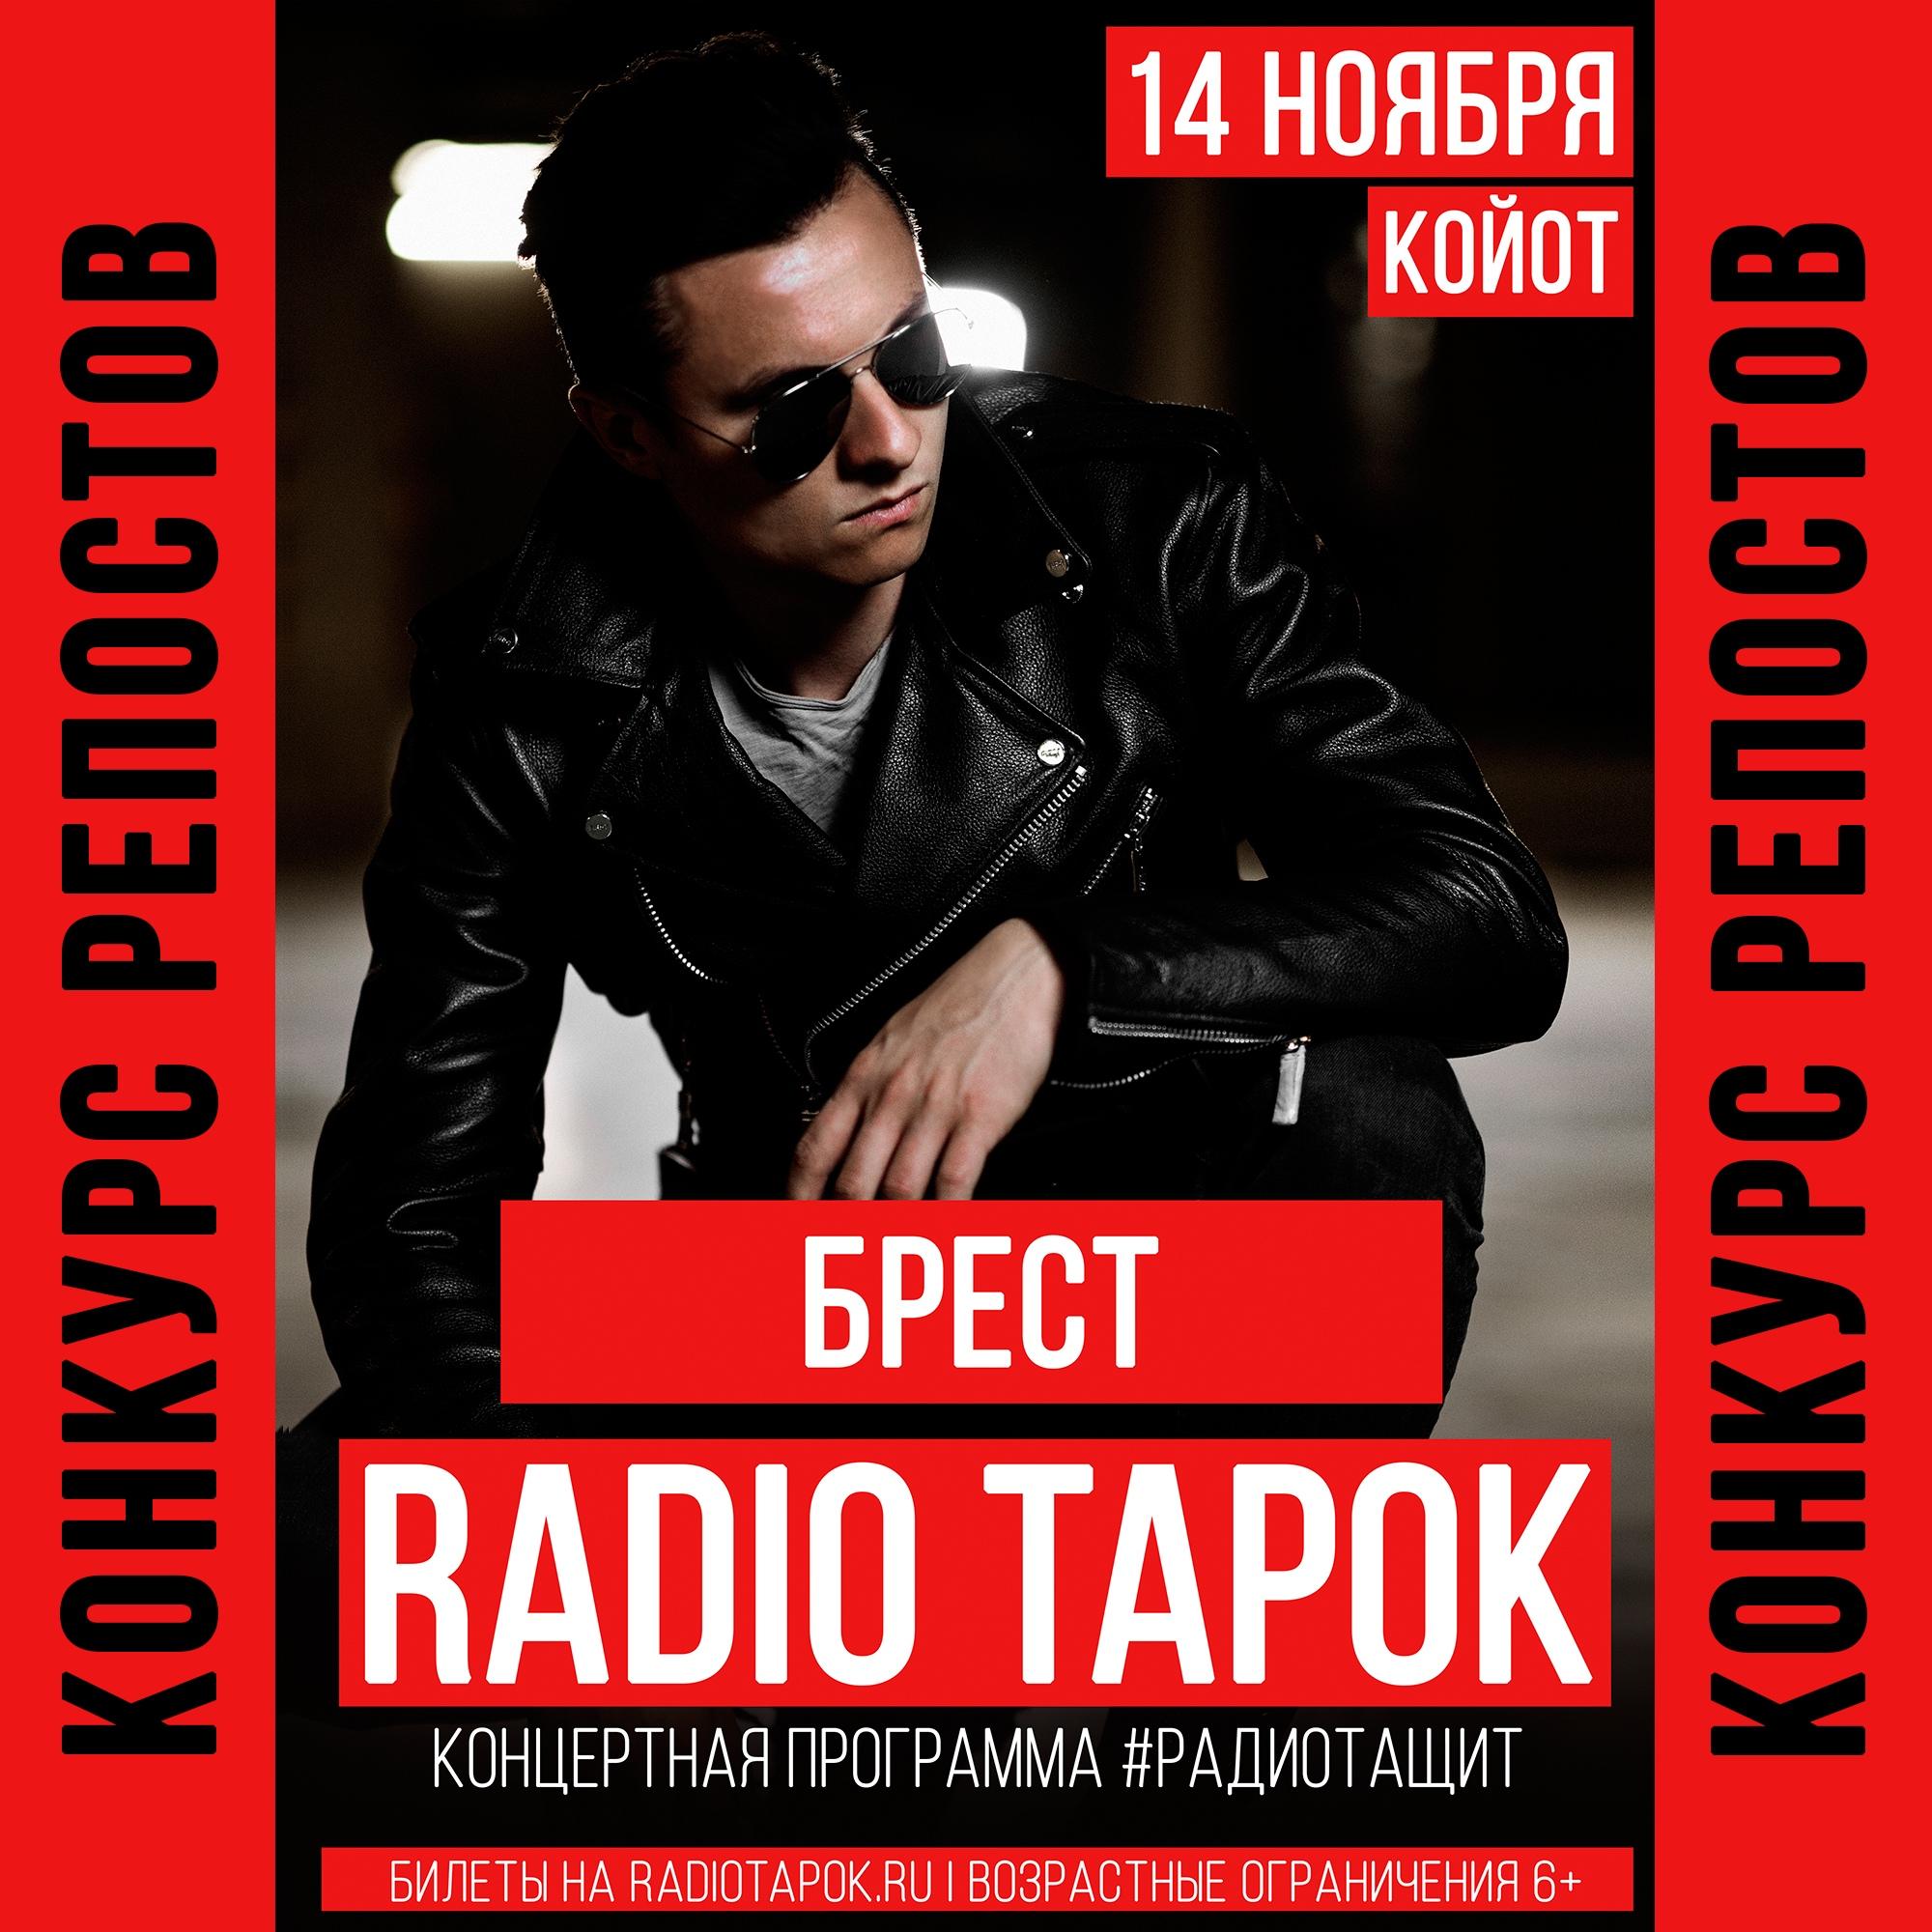 RADIO TAPOK Брест